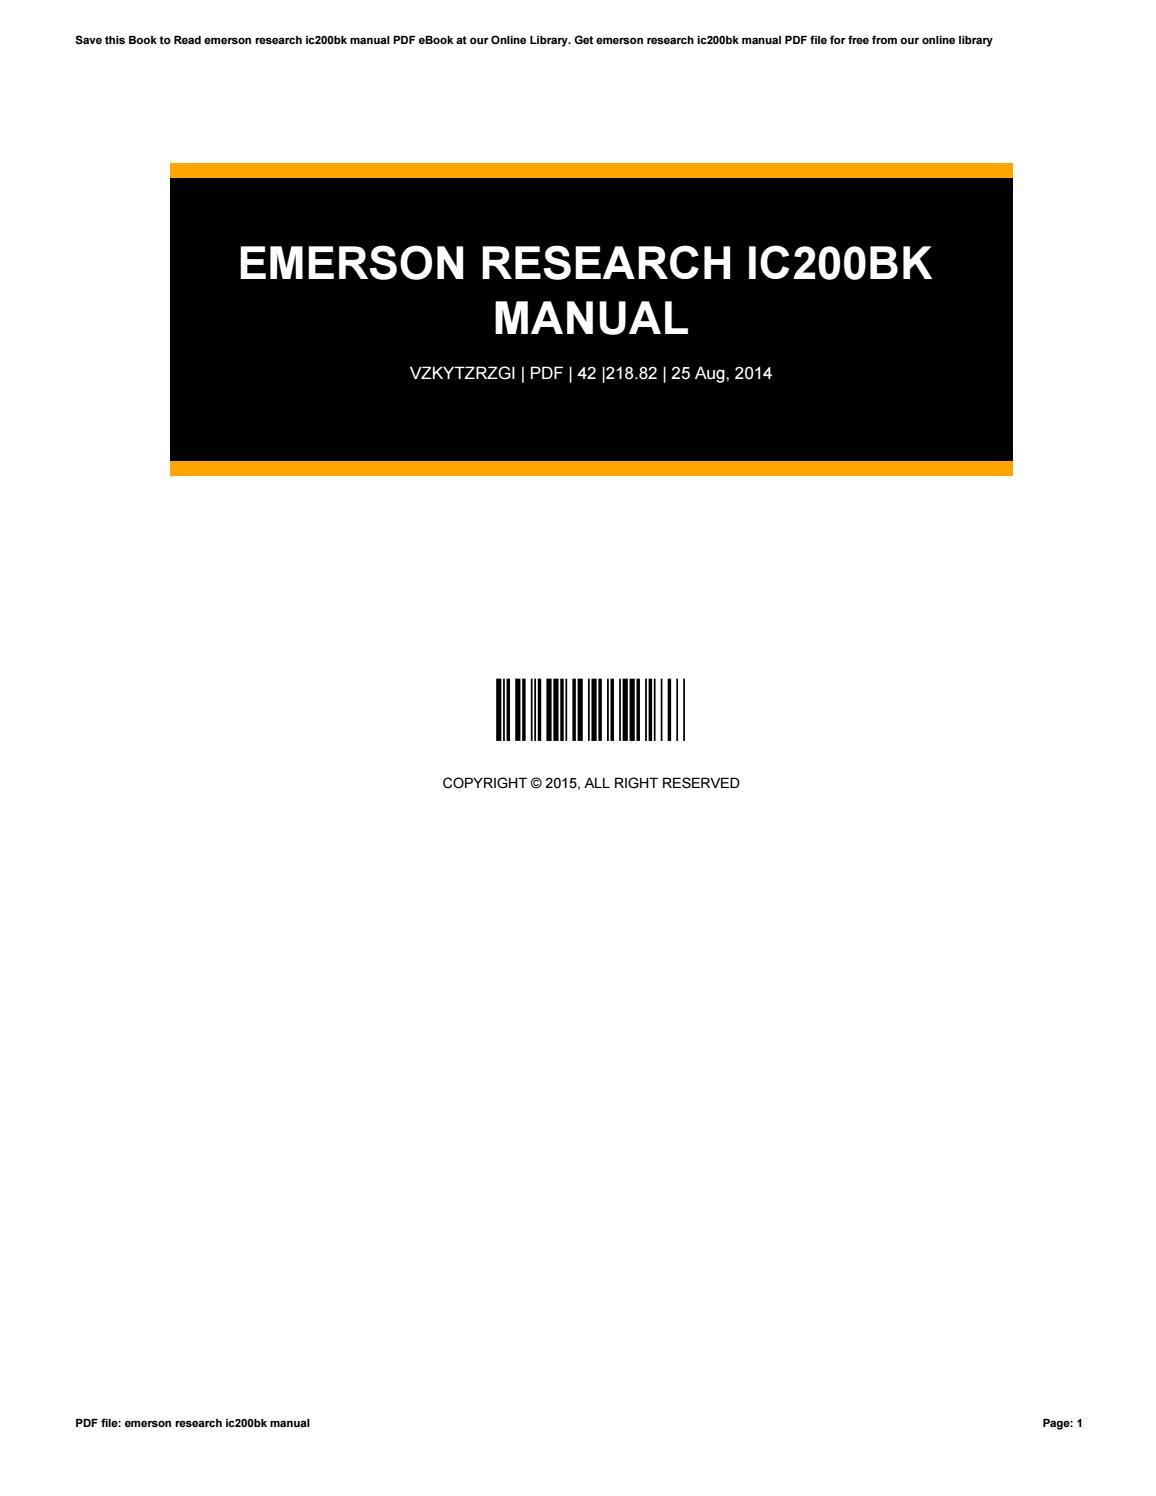 Emerson research-ic200bk-manual.